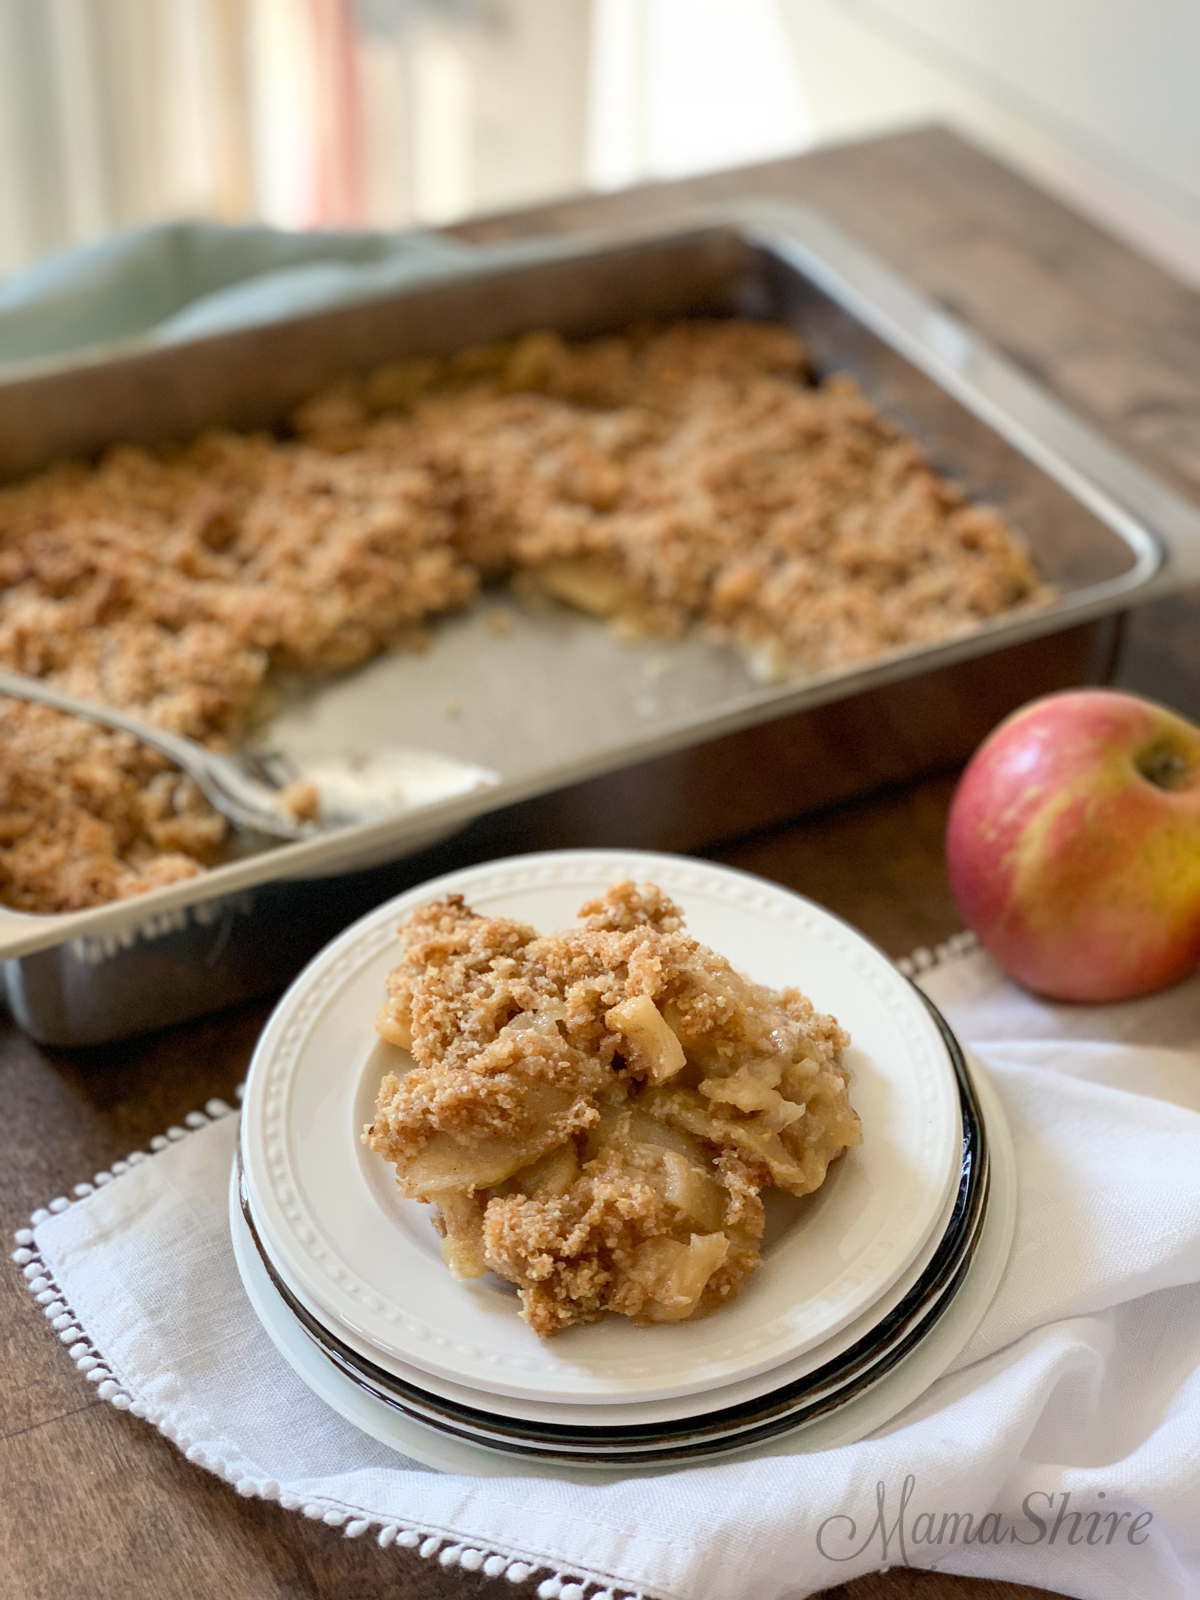 Easy Gluten-free Apple Crisp on a dessert plate.